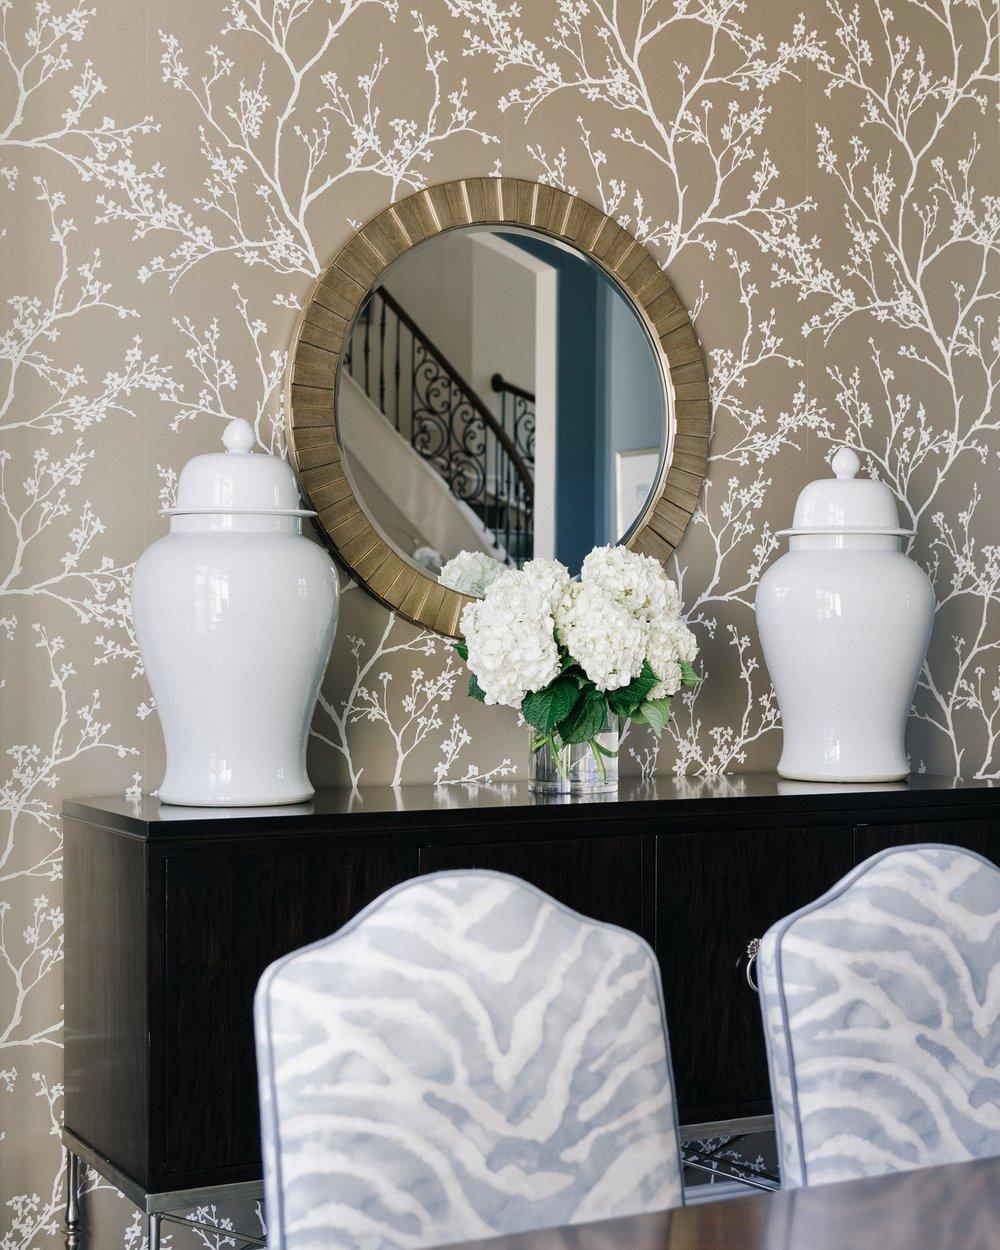 Elegant blue dining room | Carla Aston - Designer, Shaun Bain - Contractor, Colleen Scott - Photographer #diningroomideas #diningroom #bluediningroom #zebrapattern